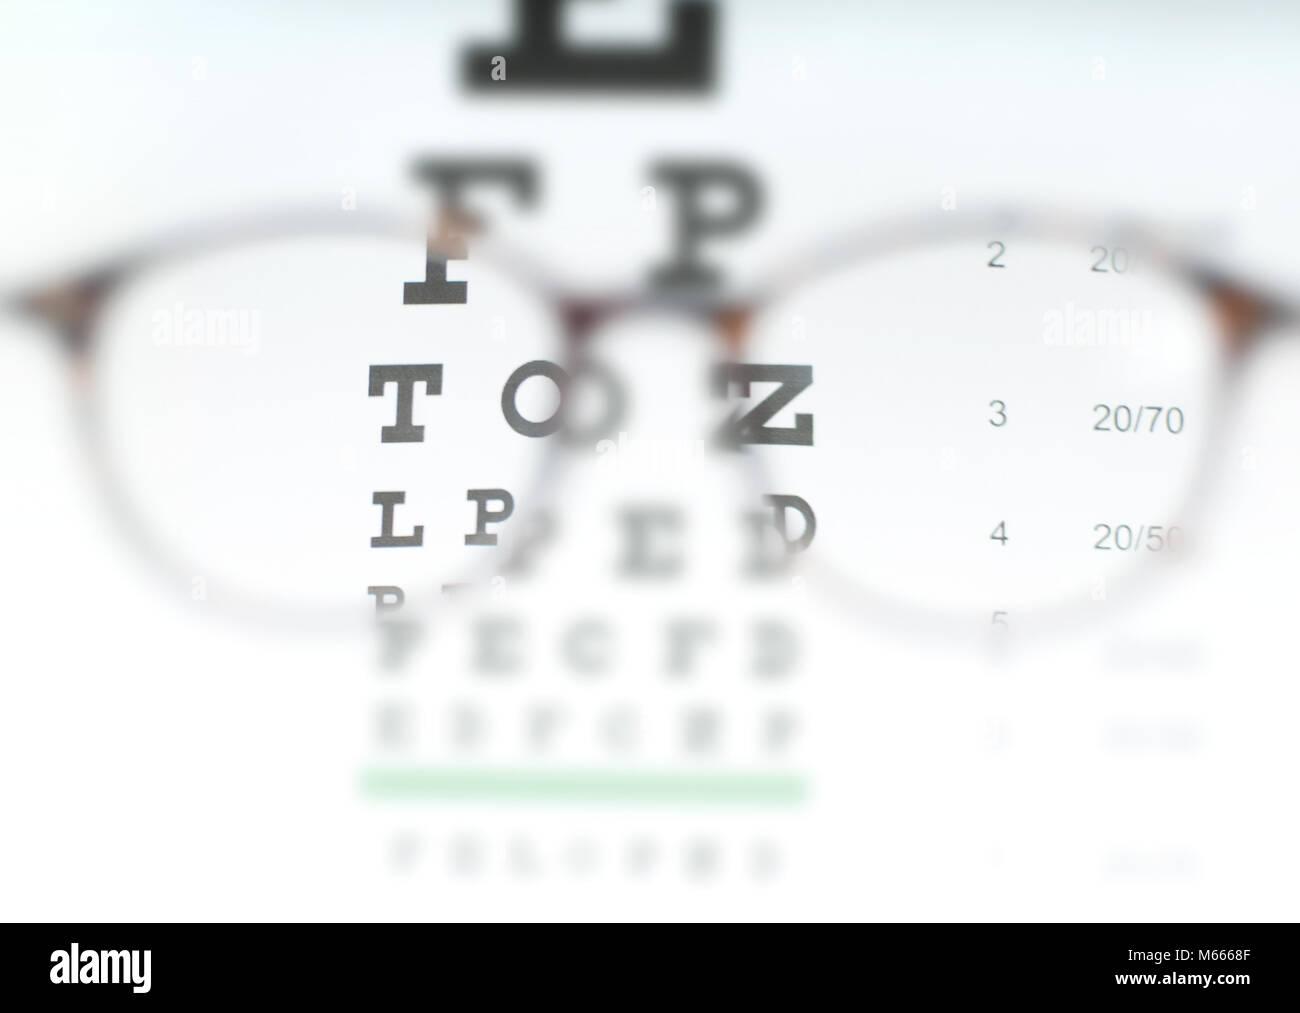 2f22419a31d Eye vision test chart seen through eye glasses. Prescription glasses sitting  on an eye test chart